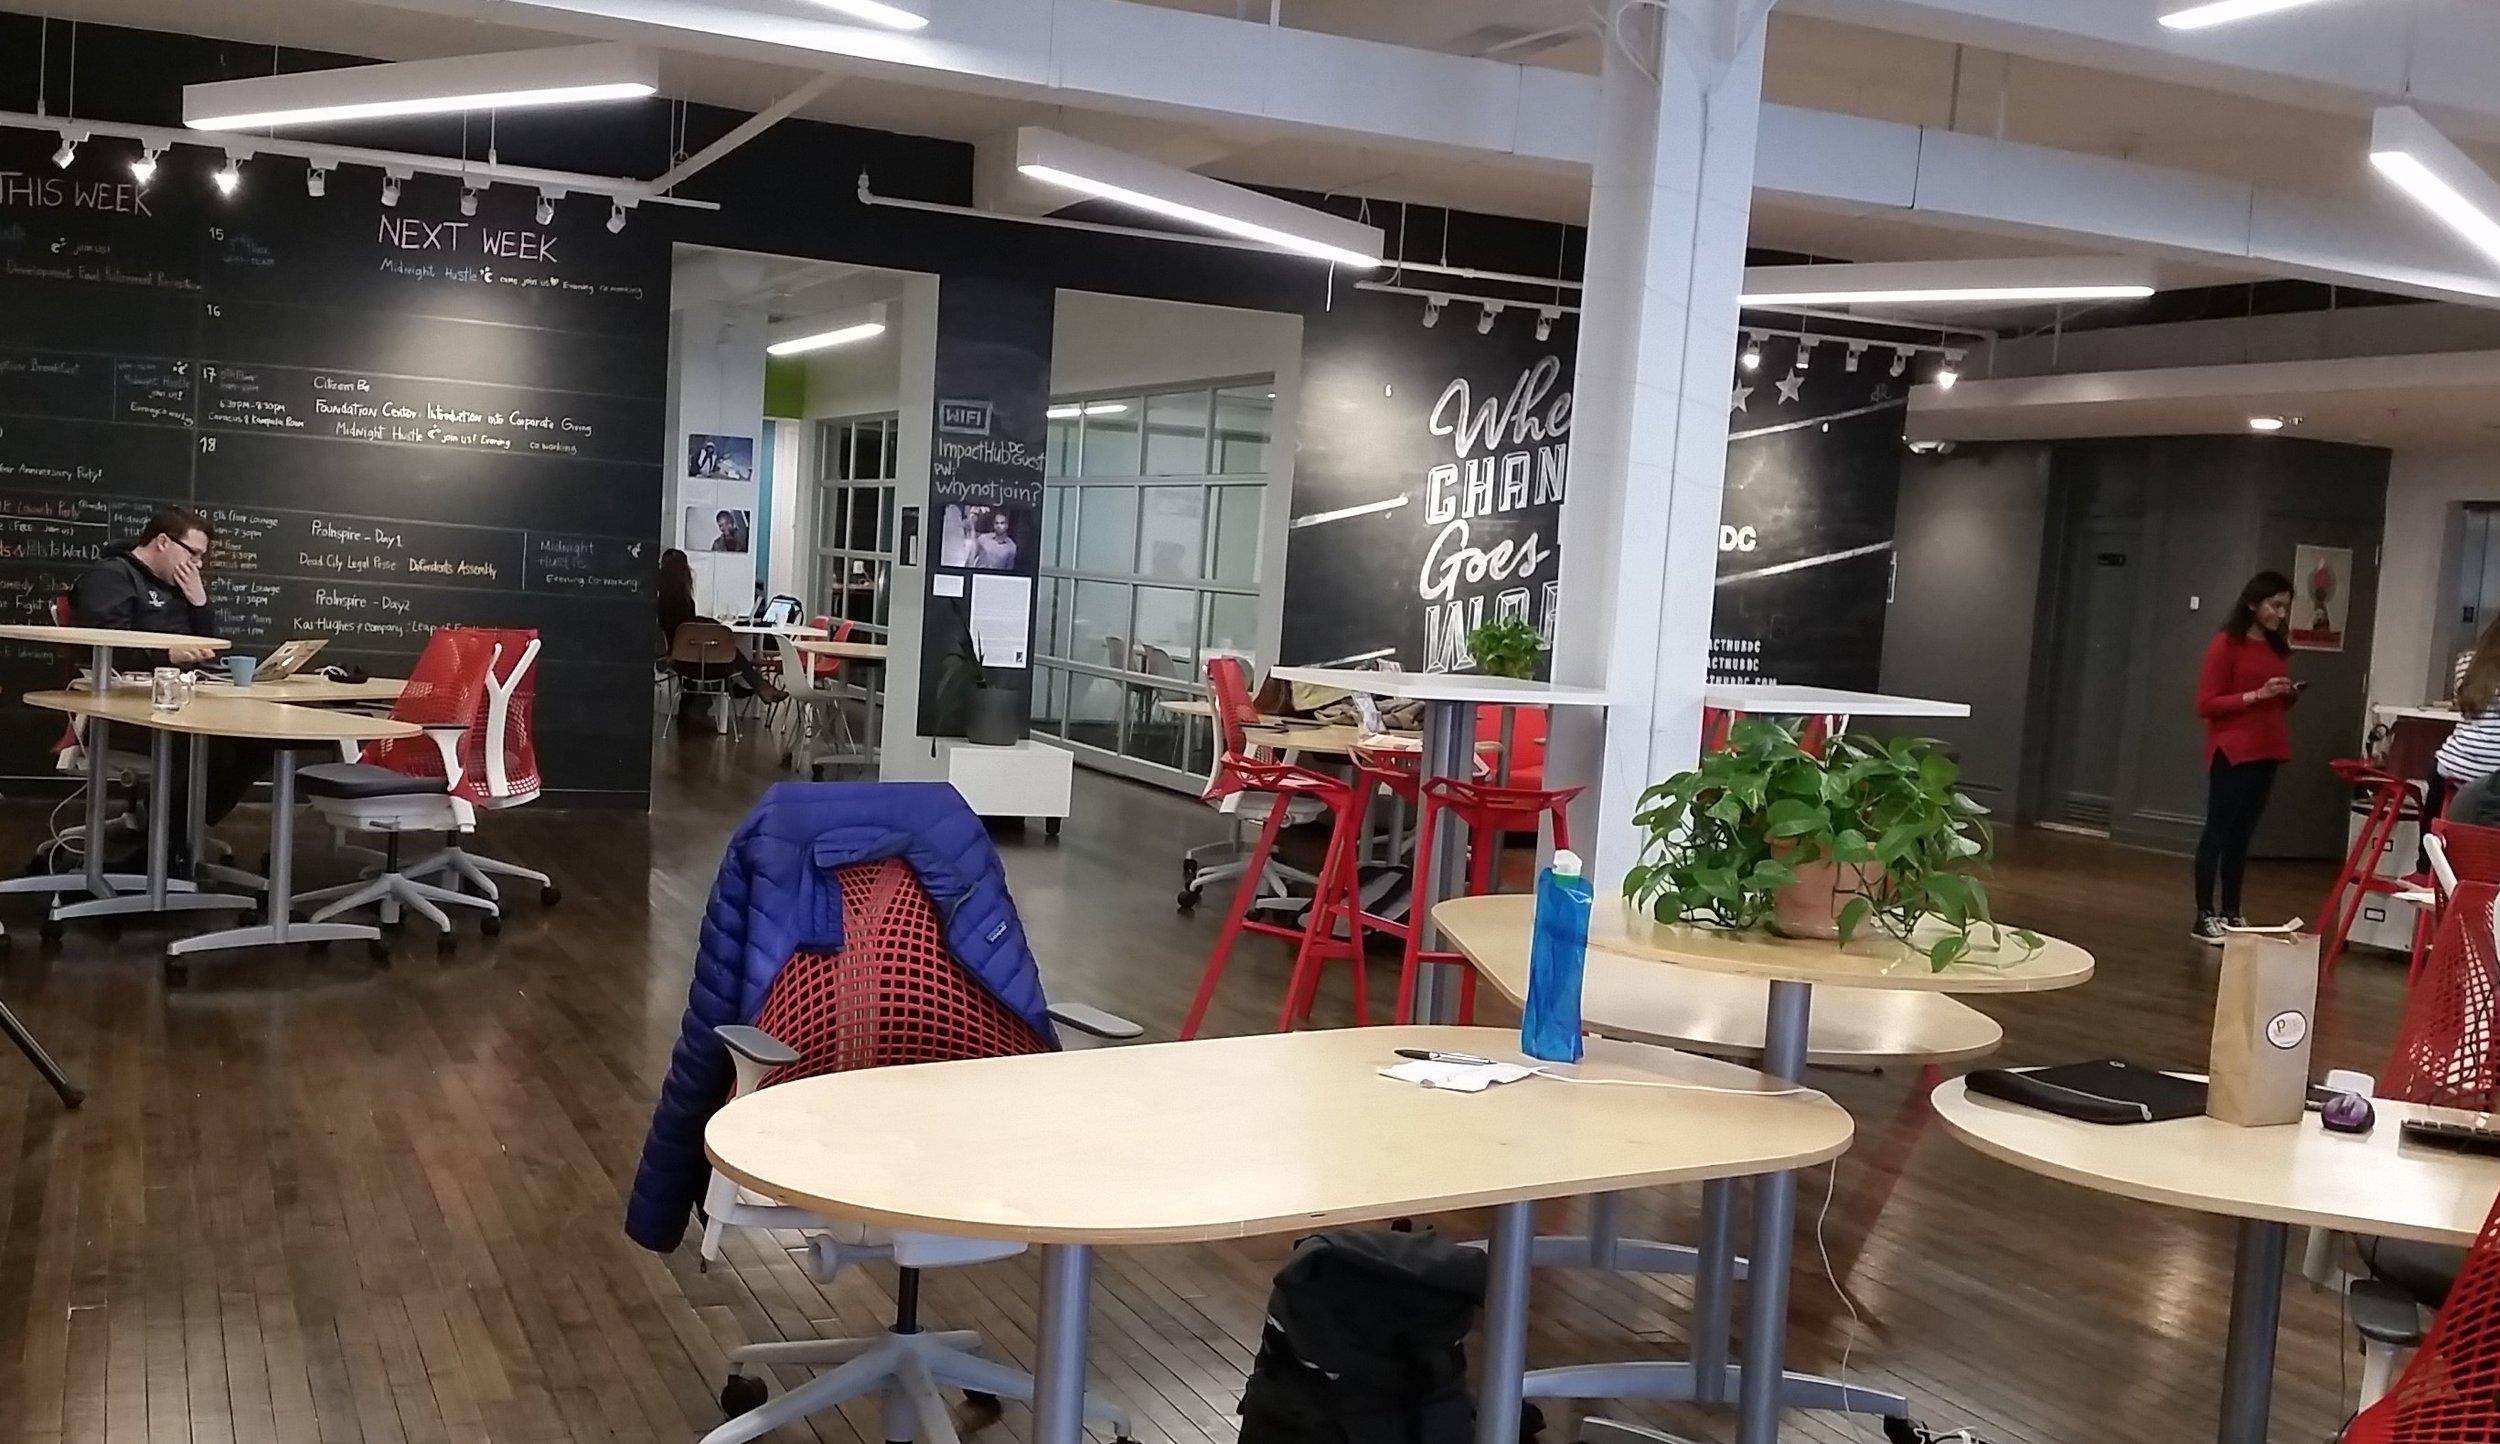 Impact Hub Coworking Space